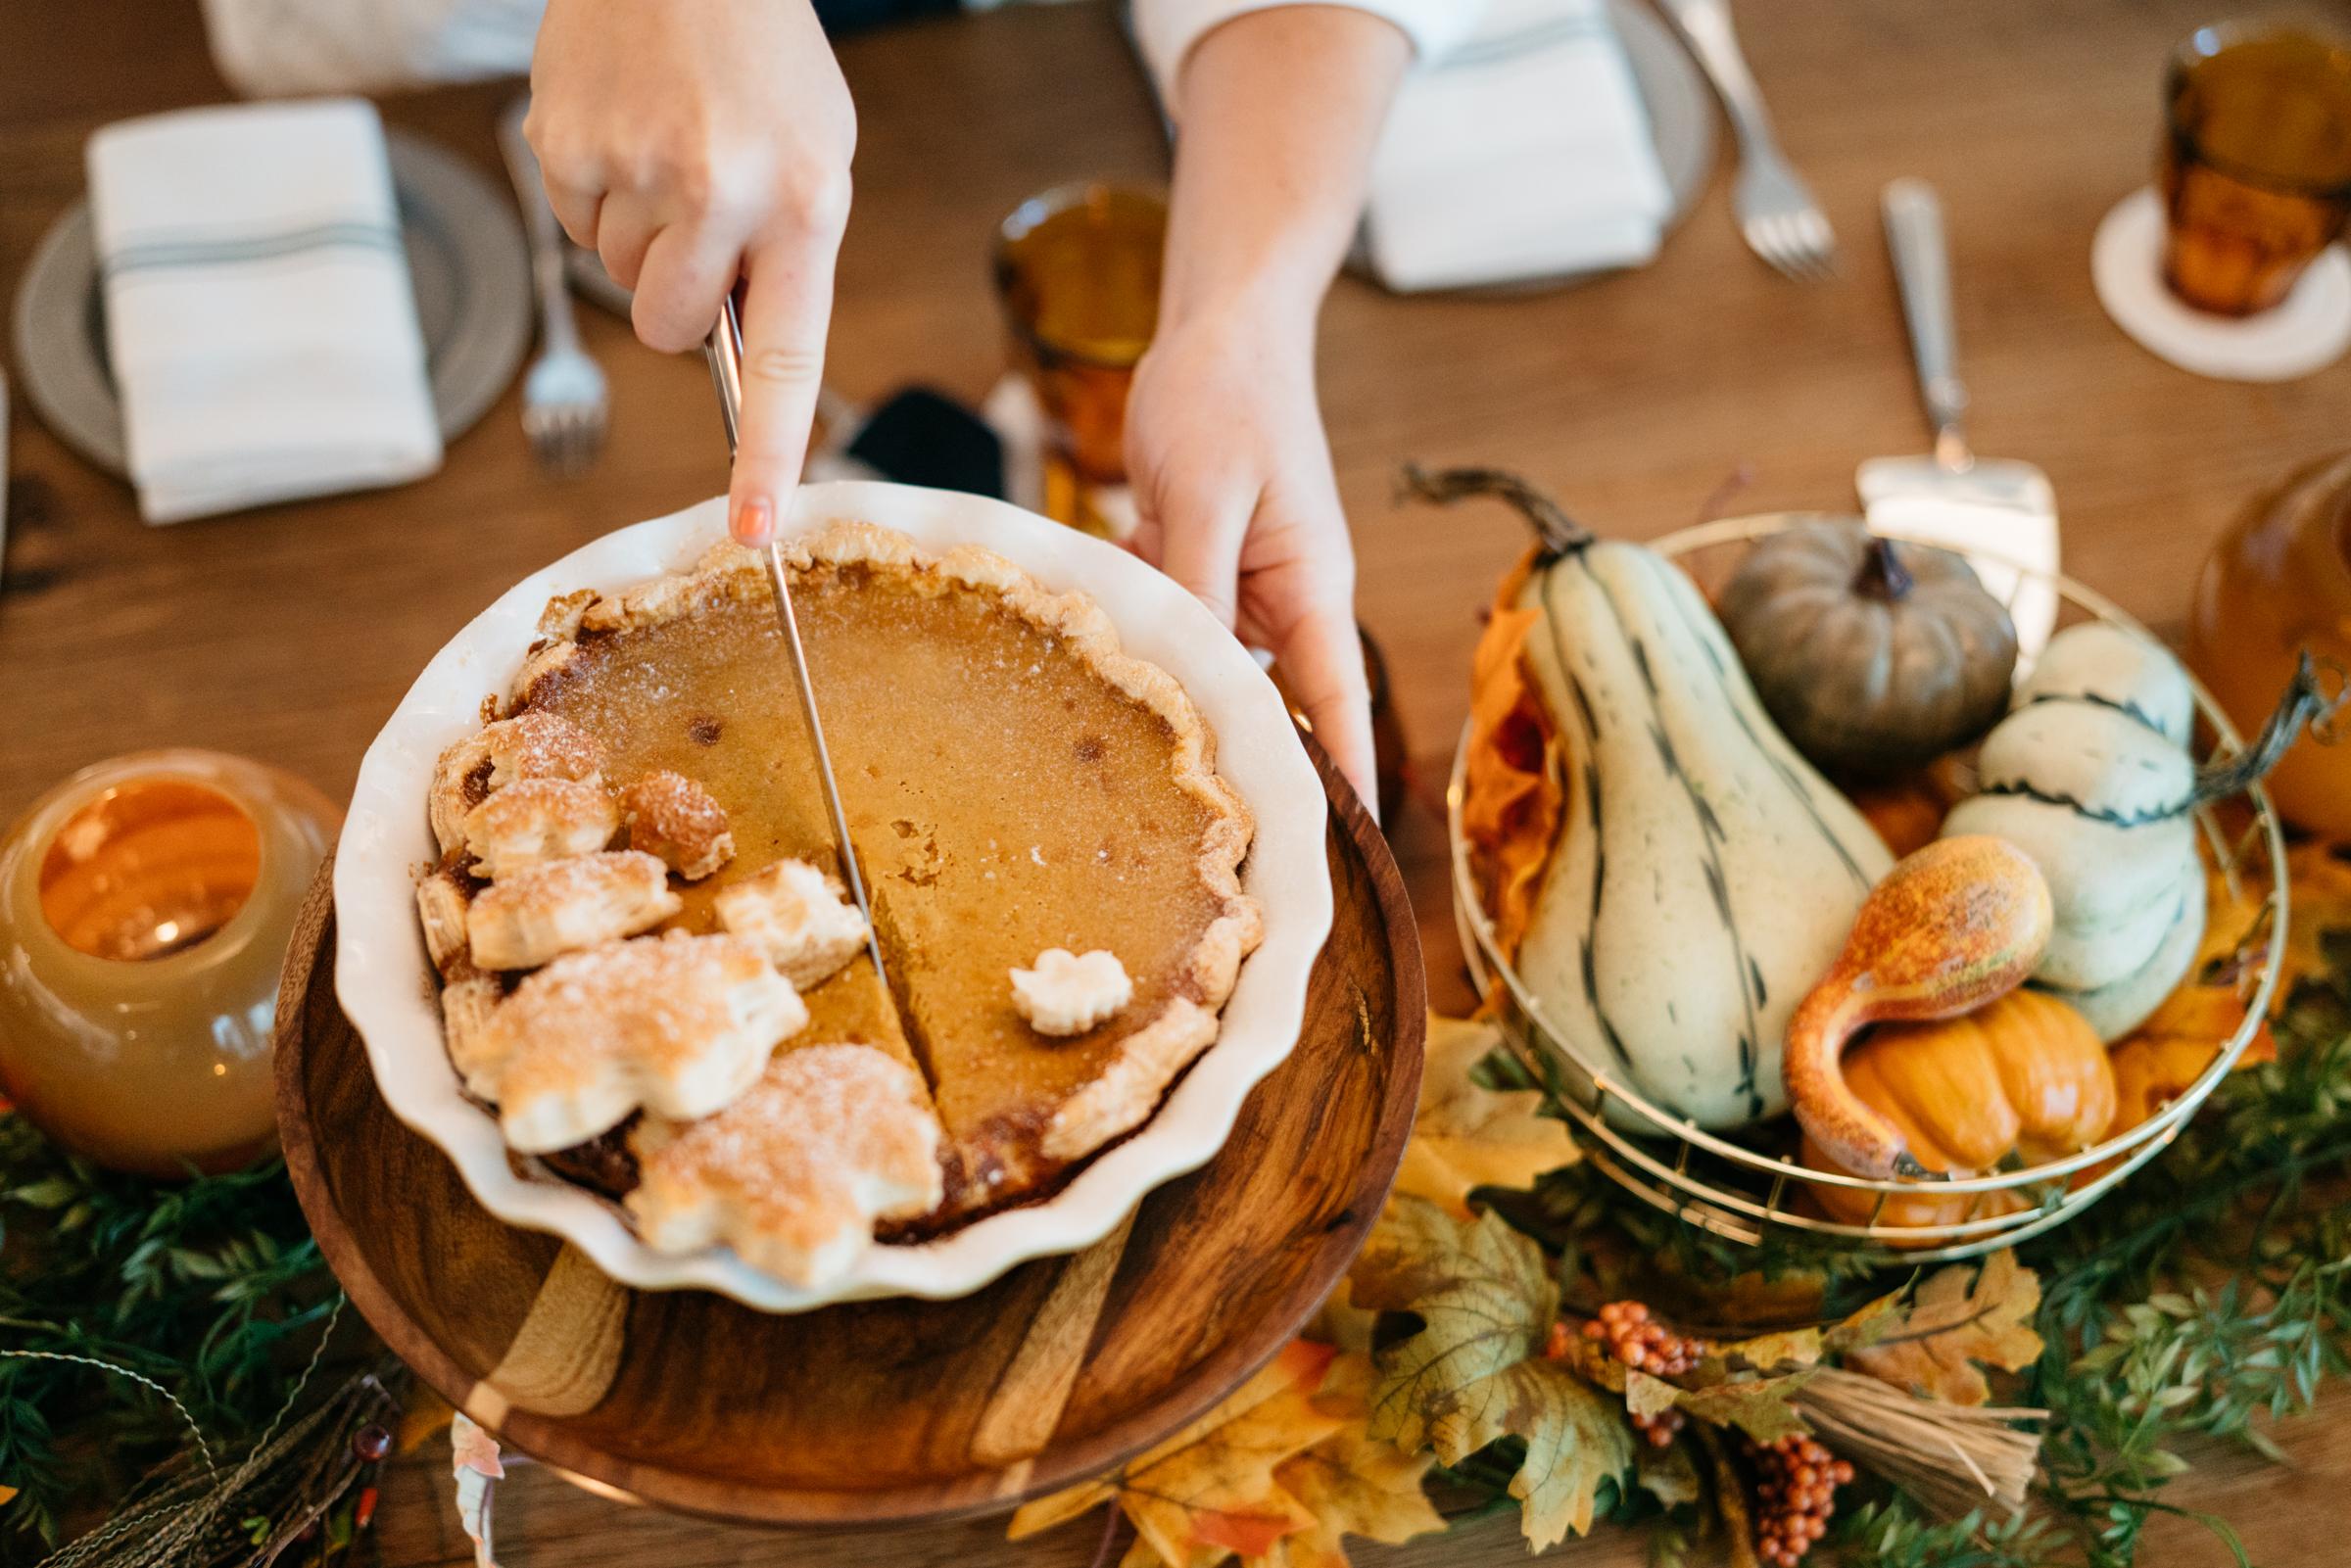 Manana's pie